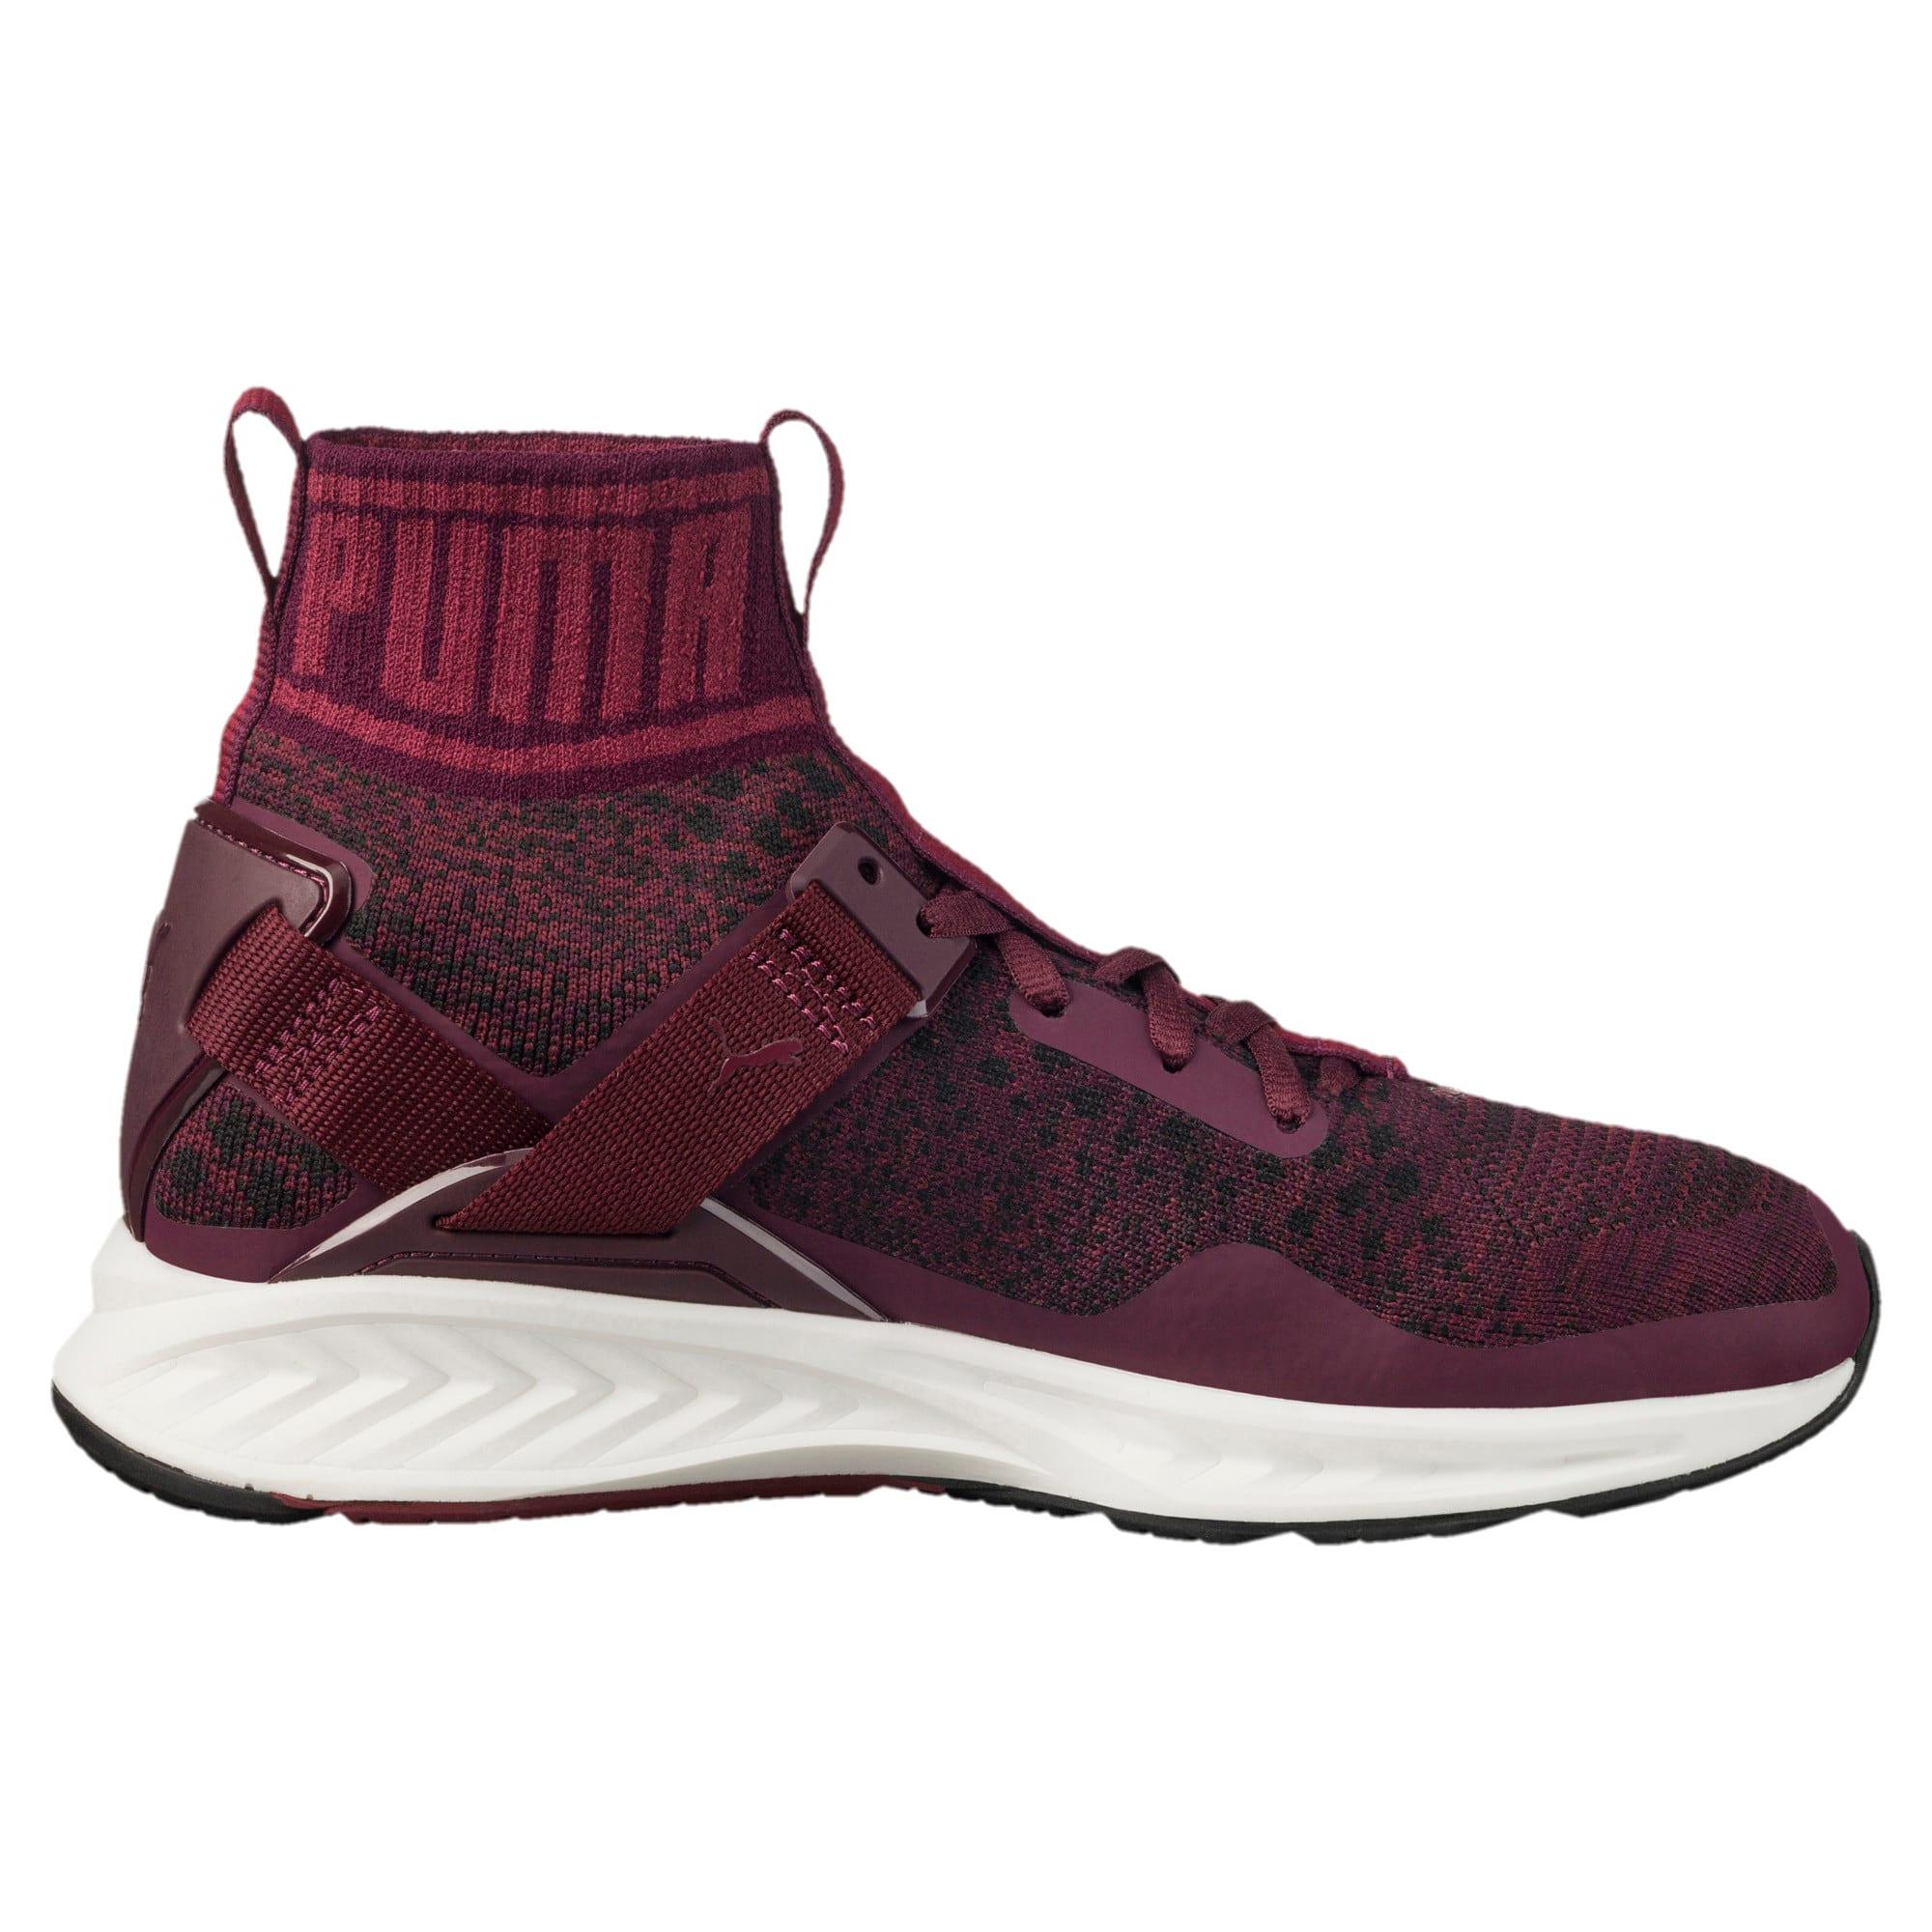 Thumbnail 3 of IGNITE evoKNIT Women's Training Shoes, Winetasting-CABARET-Black, medium